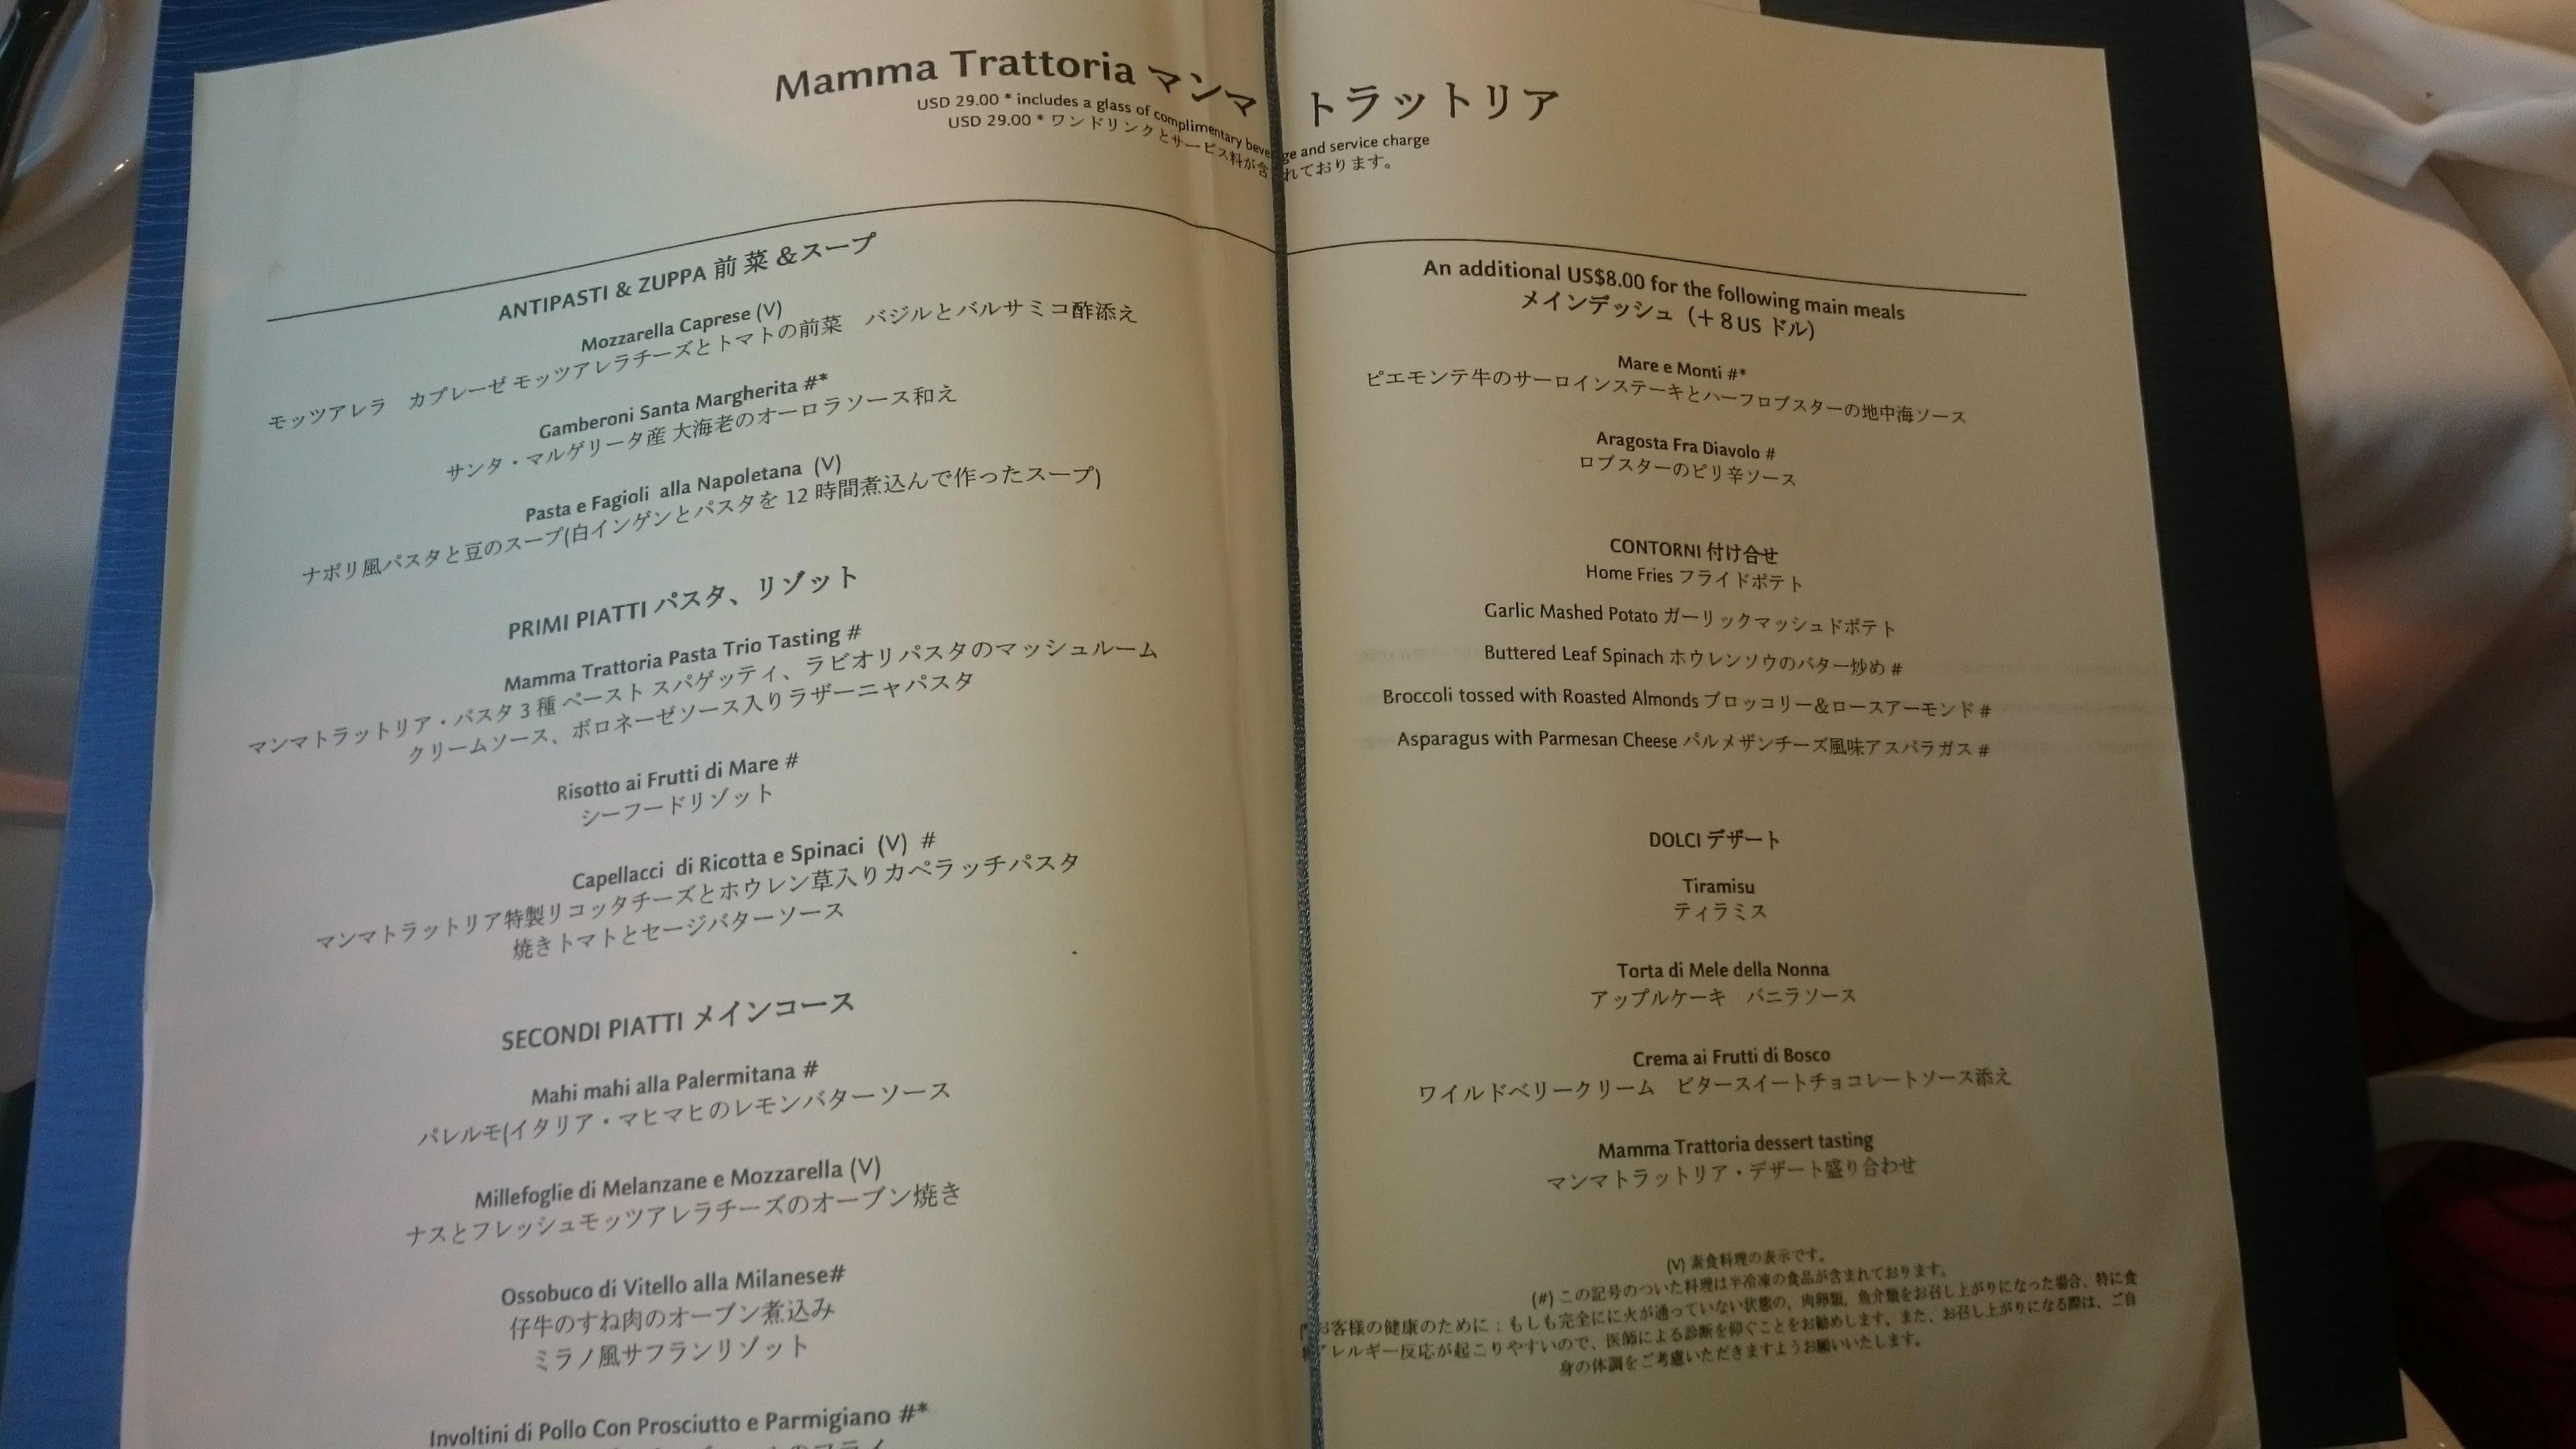 manma_menu.jpg